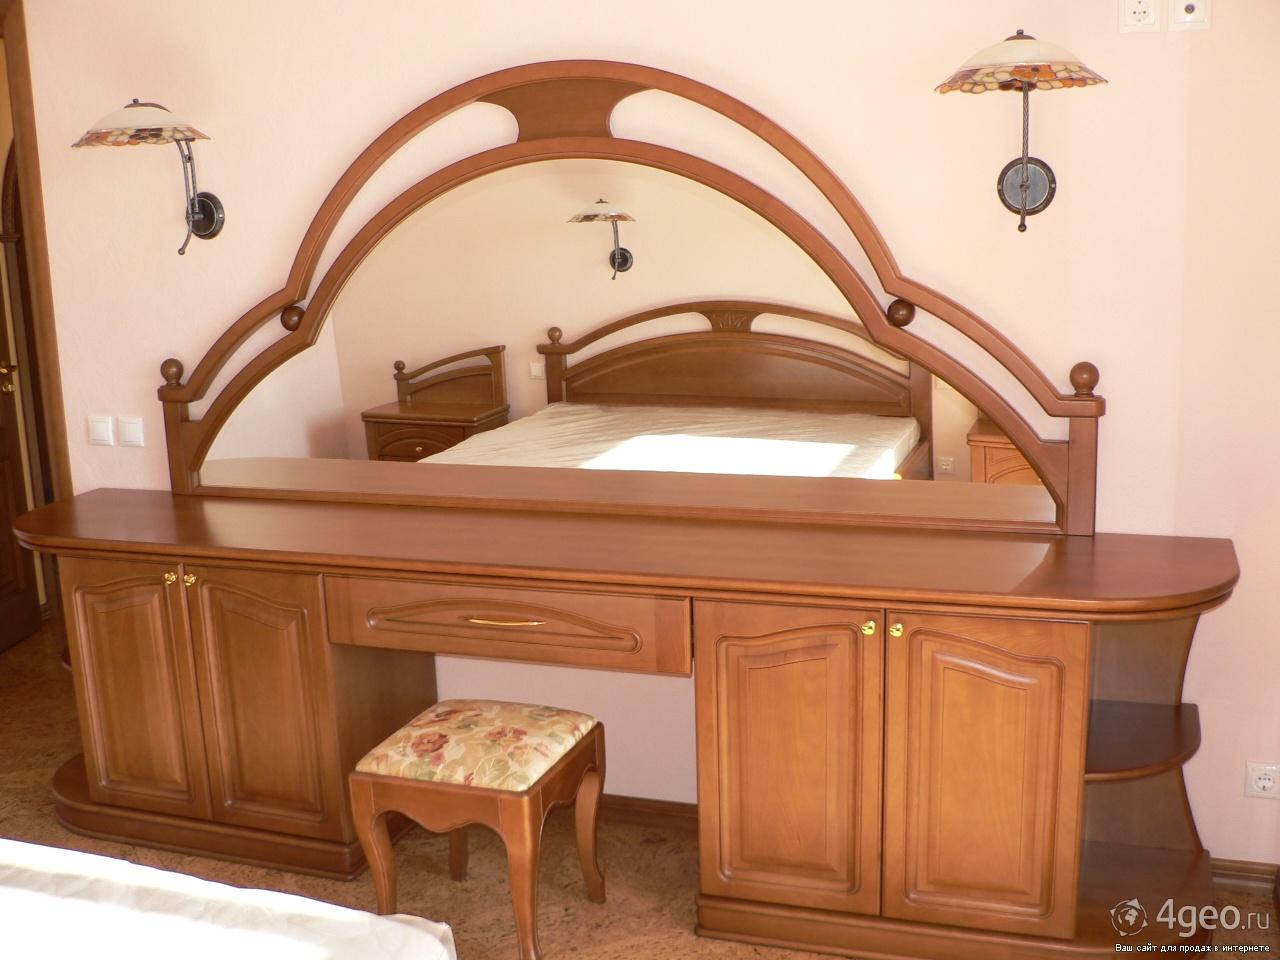 Кассандра 2012 ооо, фабрика индивидуальной мебели изготовлен.